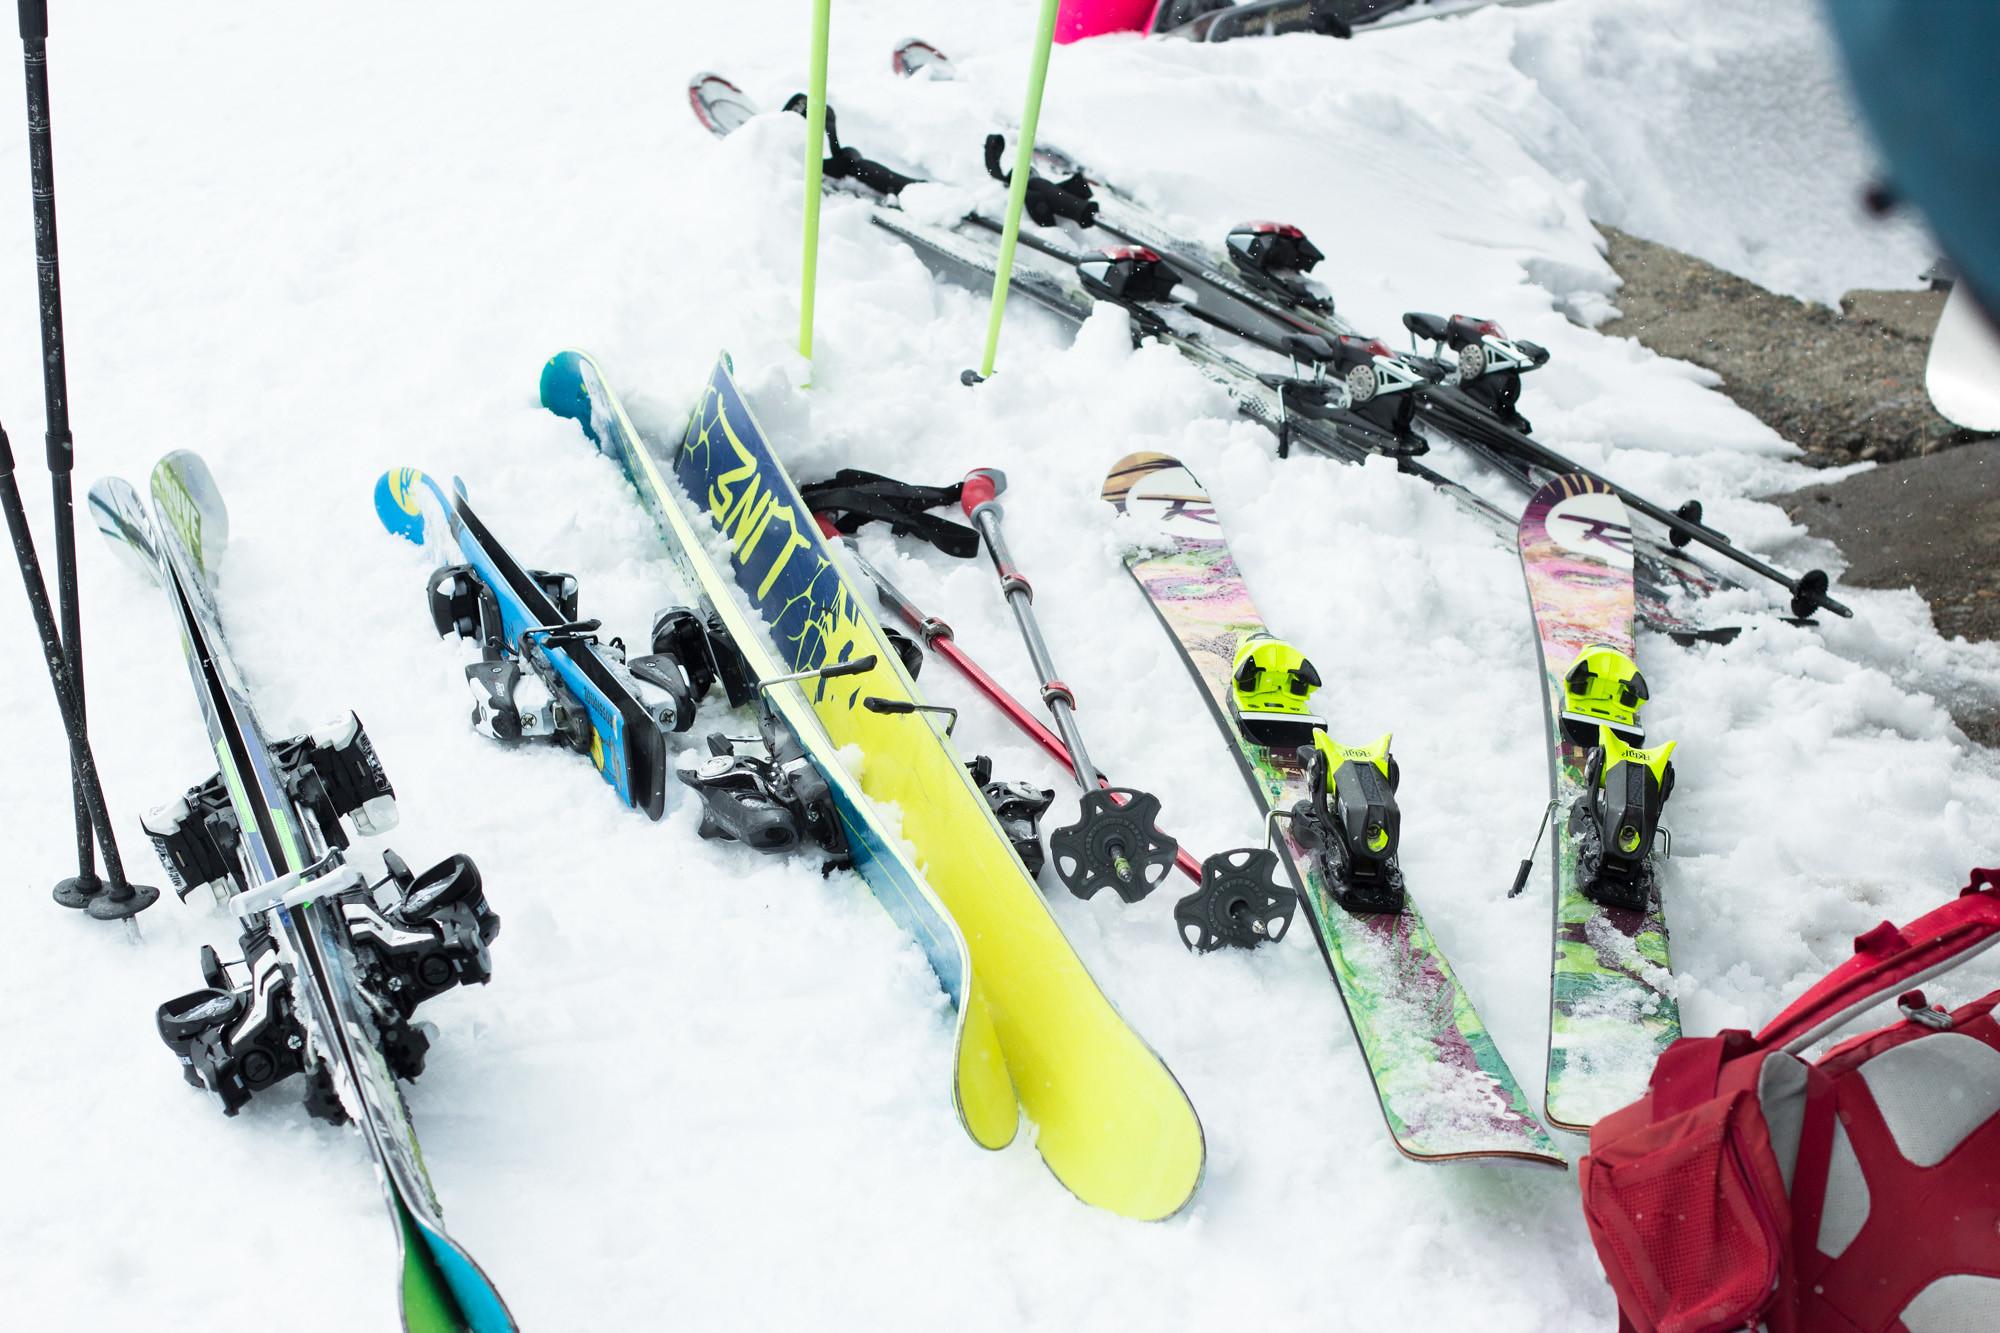 Прокат лыж, Гудаури